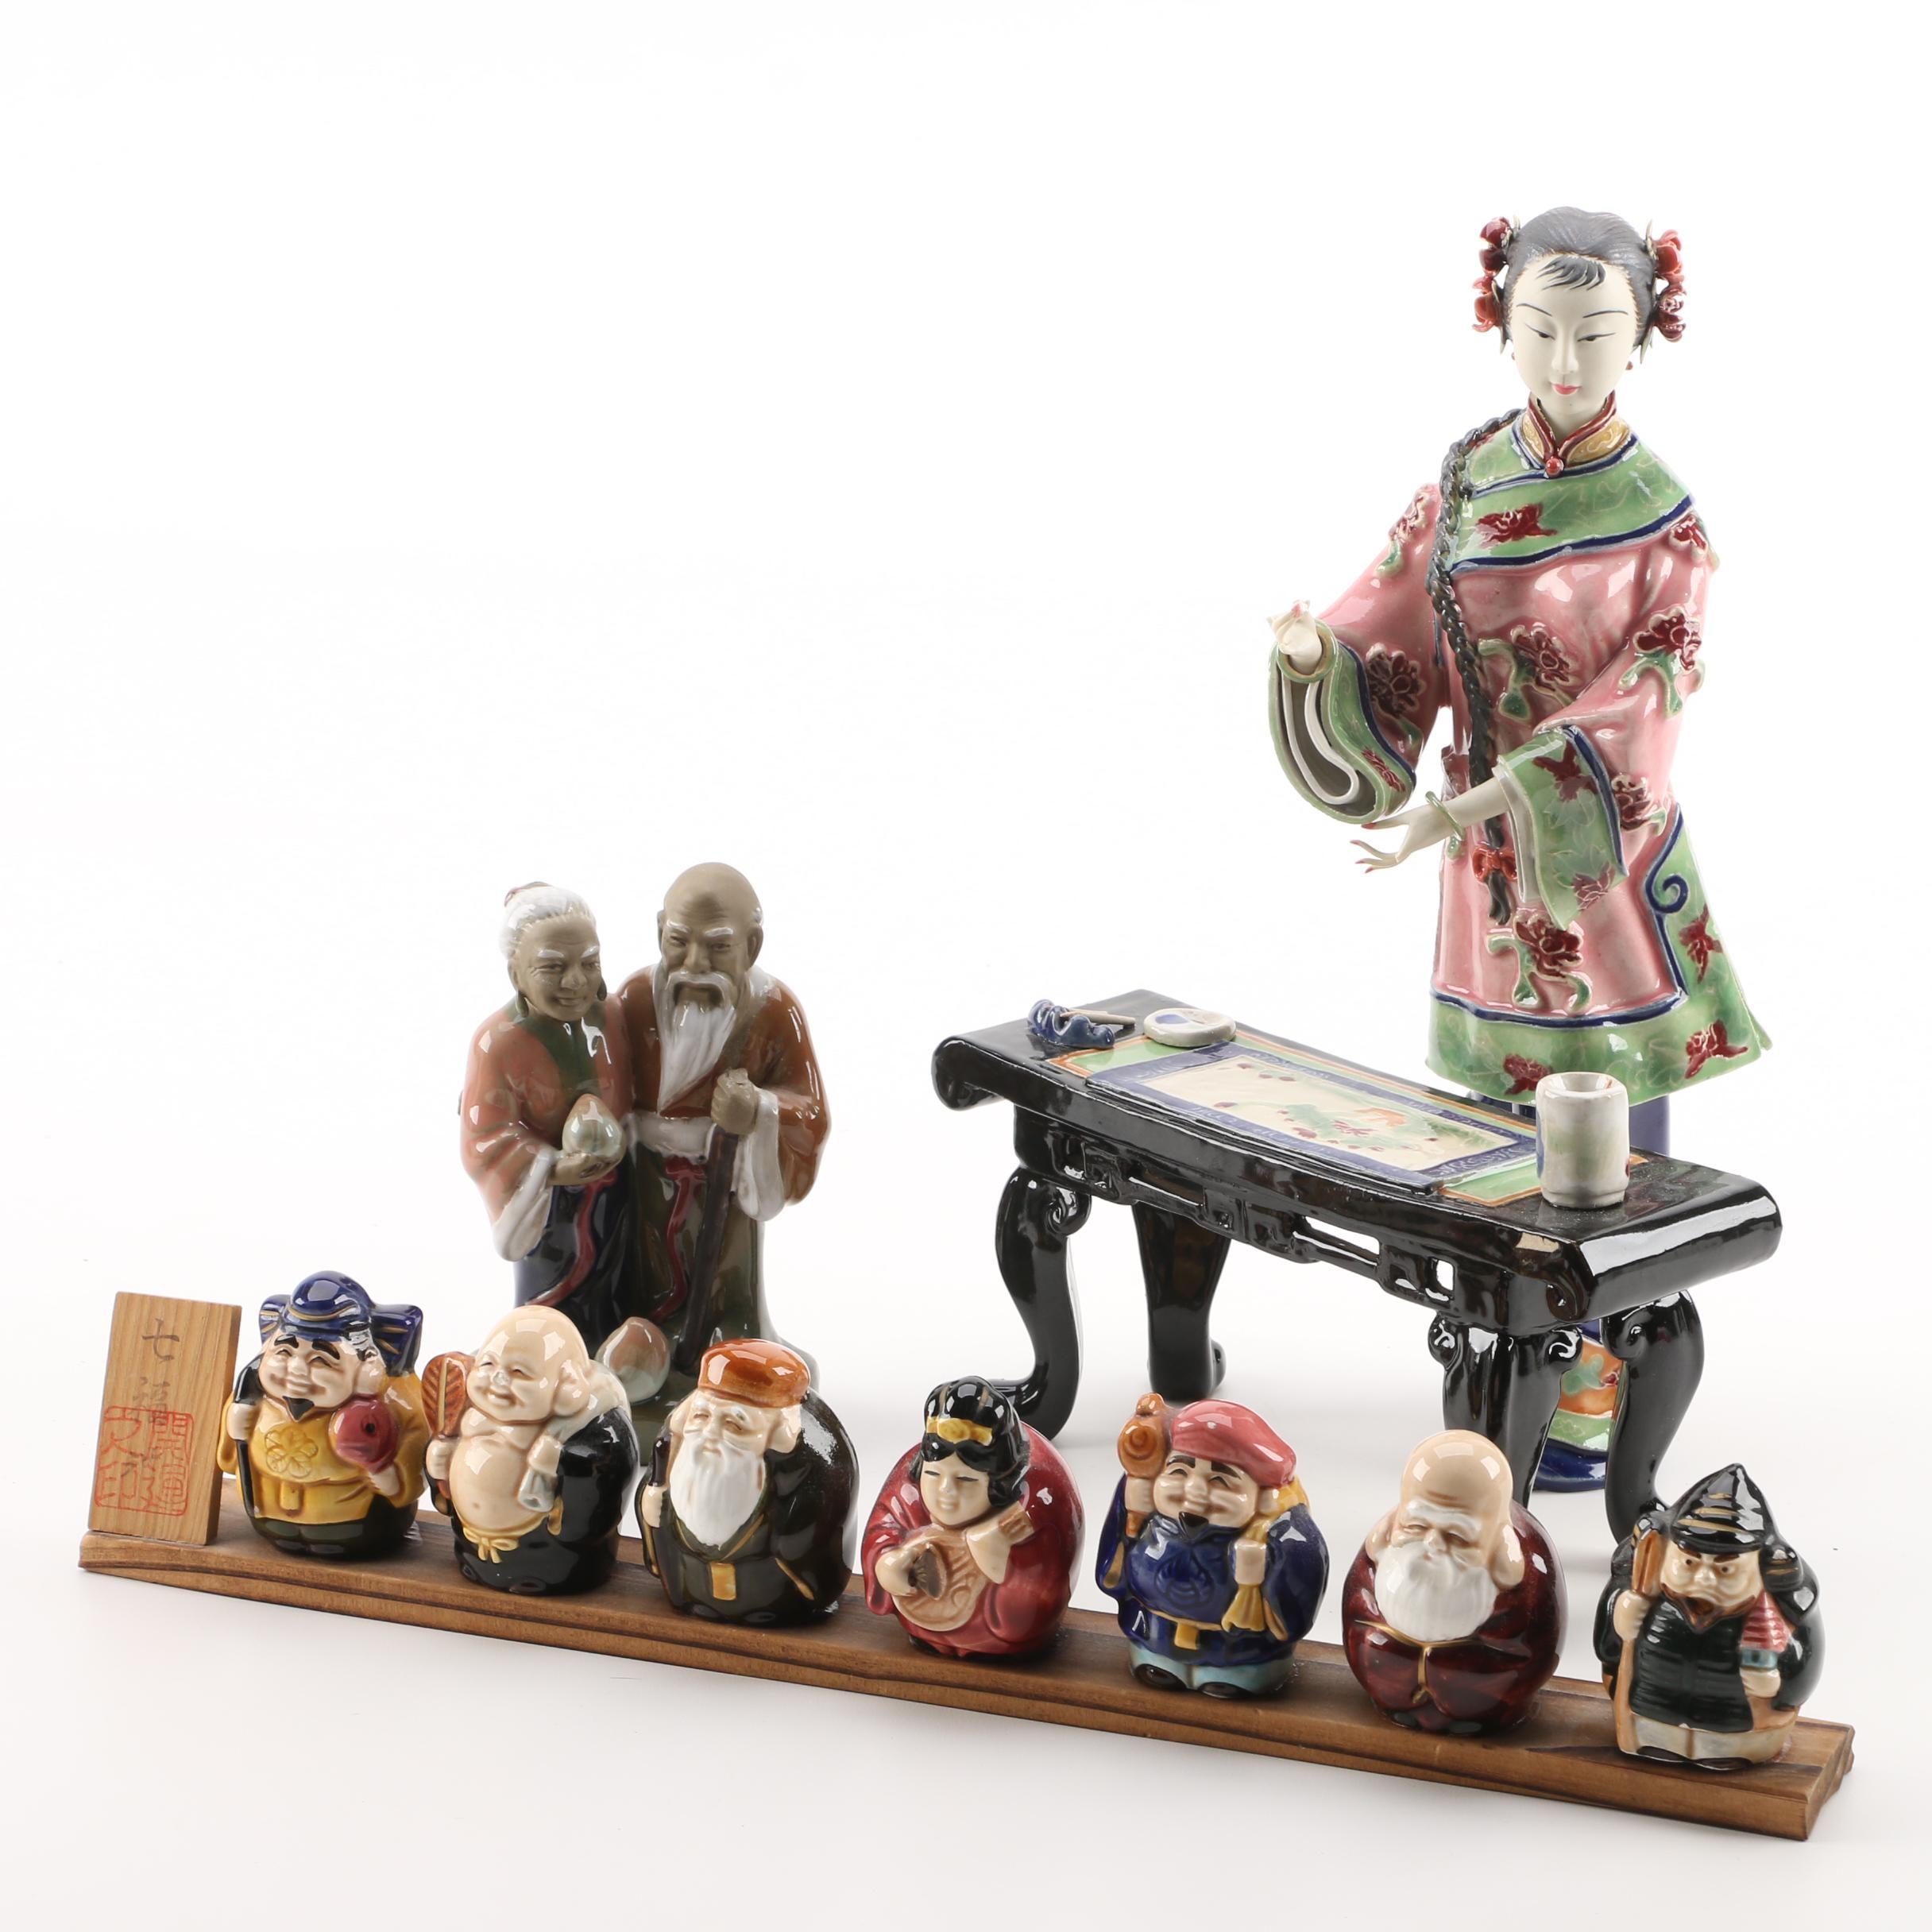 Chinese and Japanese Ceramic Figurines